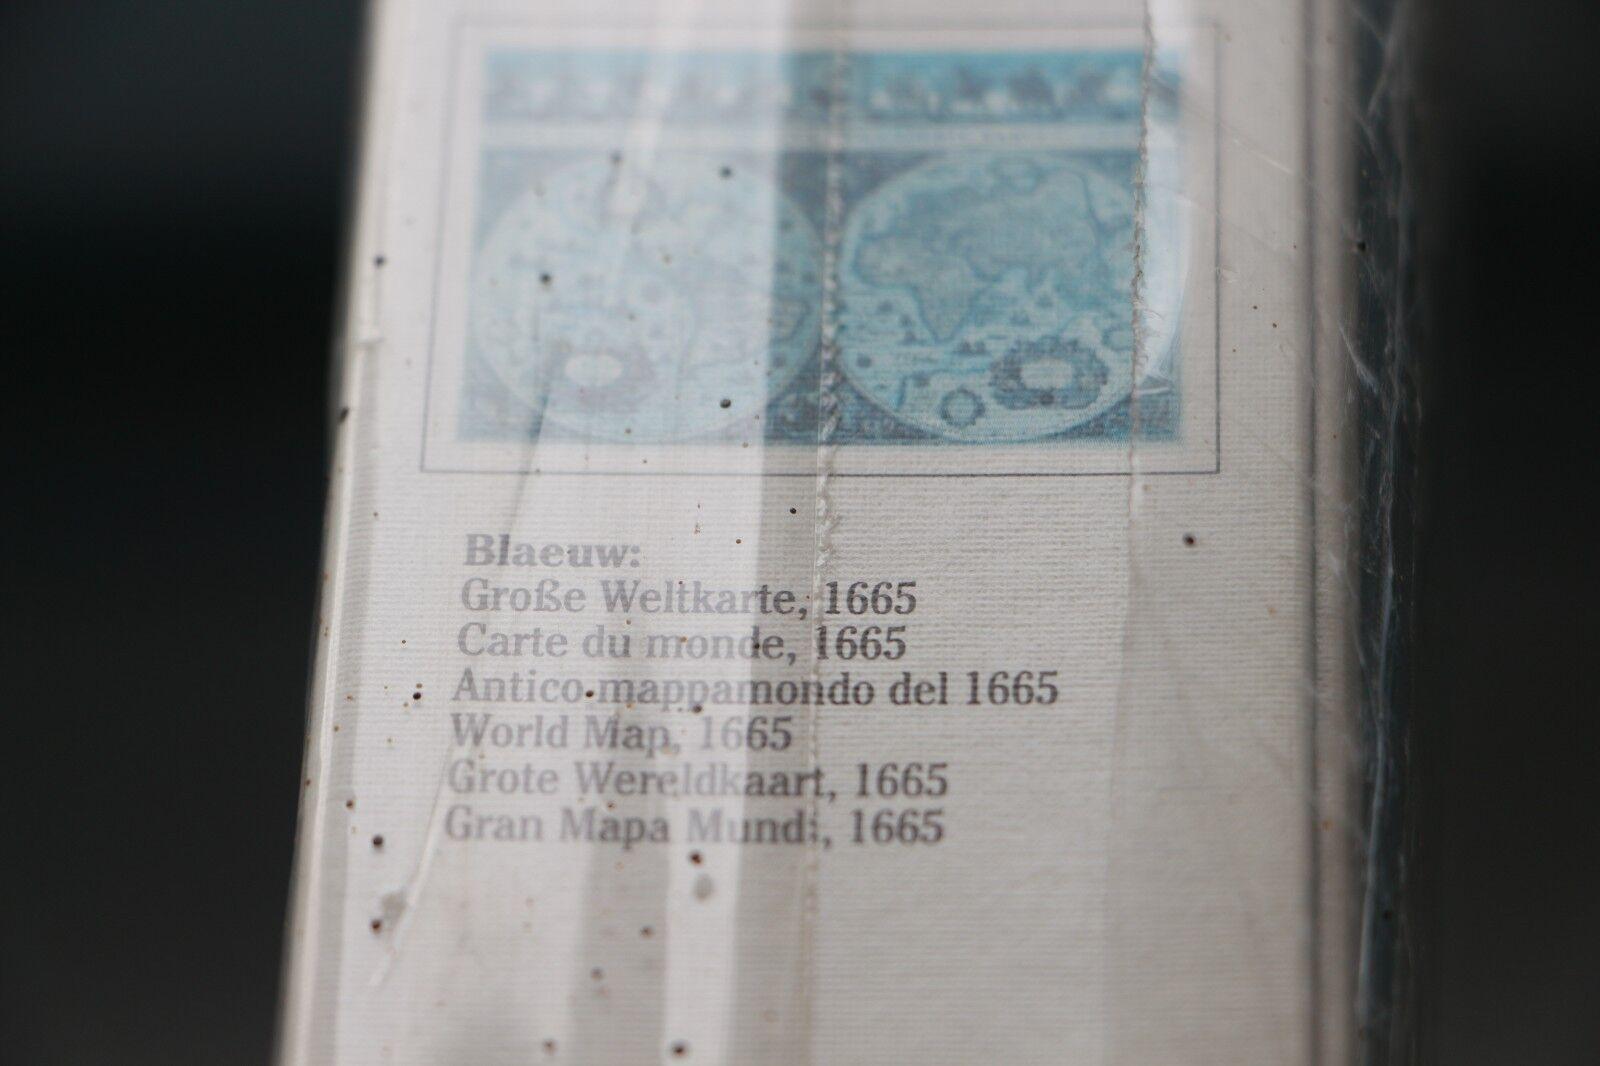 RAVENSBURGER PUZZLE 170548 WORLD MAP 1665 1994 NEW  YEAR 1994 1665 IN SEALED BOX b0e6bc